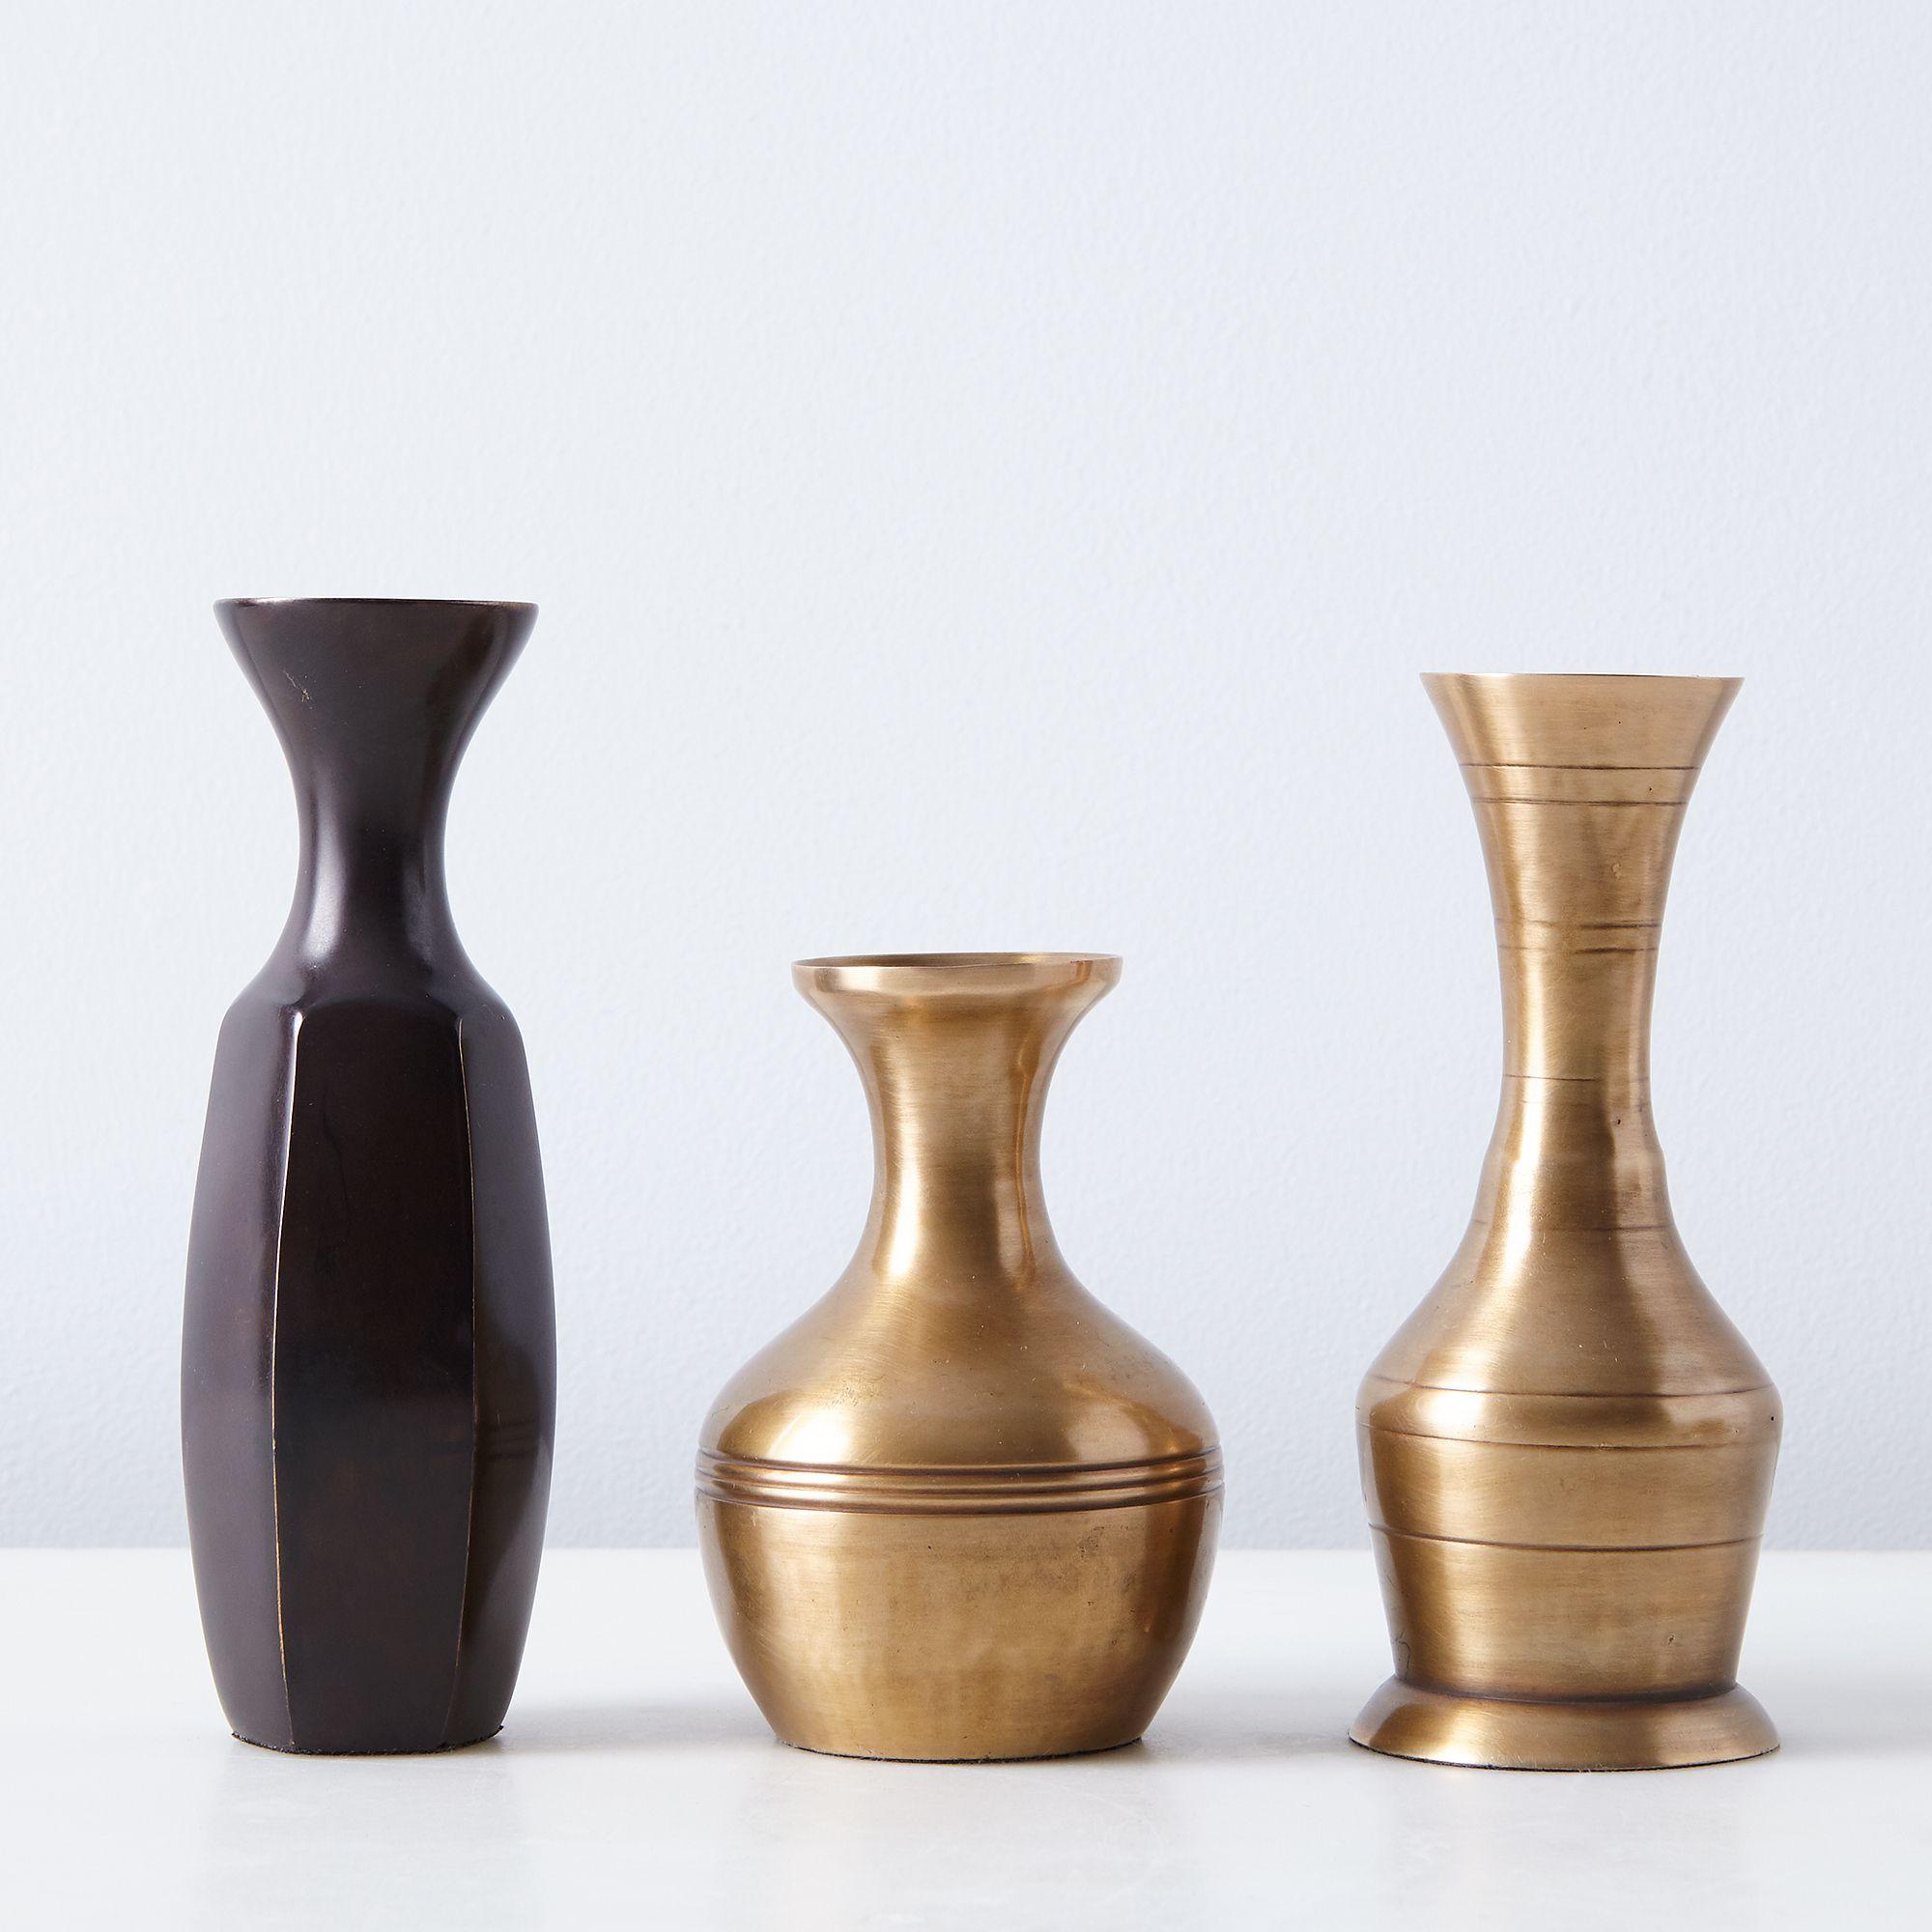 food52 vintage inspired brass bud vases set of 3 on food52